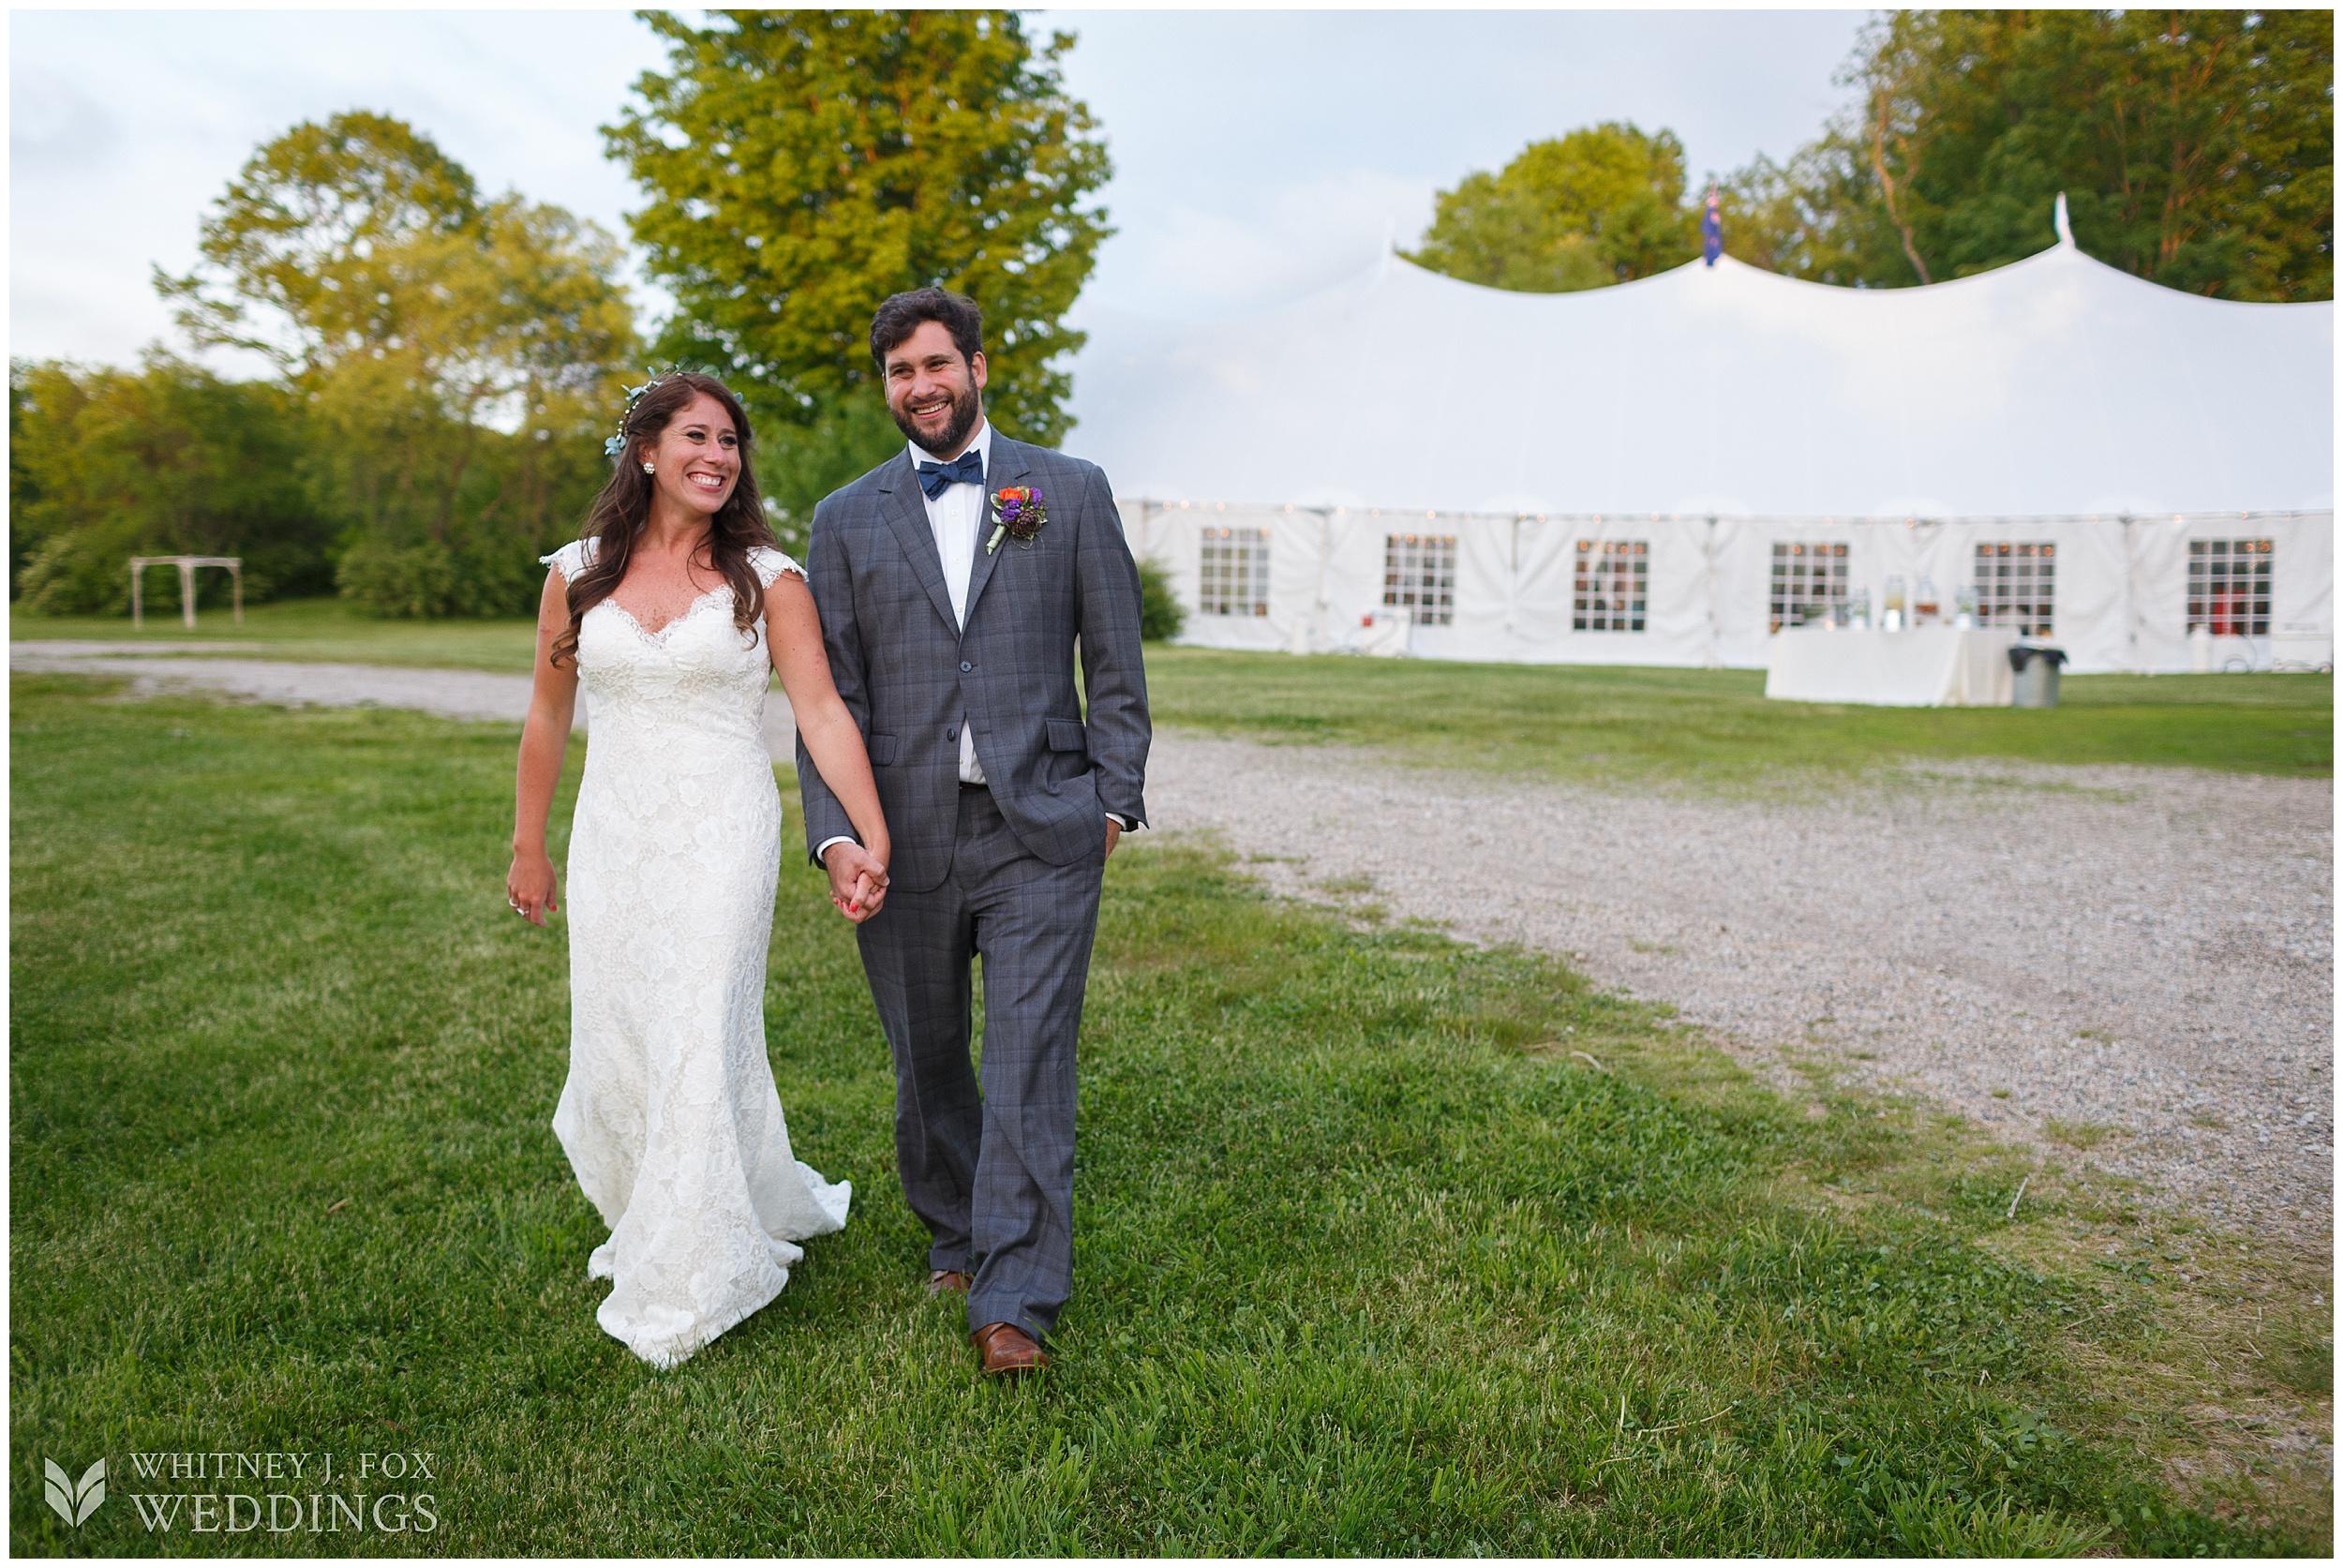 86_170_tai_josh_the_homestead_rest_be_thankful_farm_lyman_maine_photographer_whitney_j_fox_weddings_0532.jpg